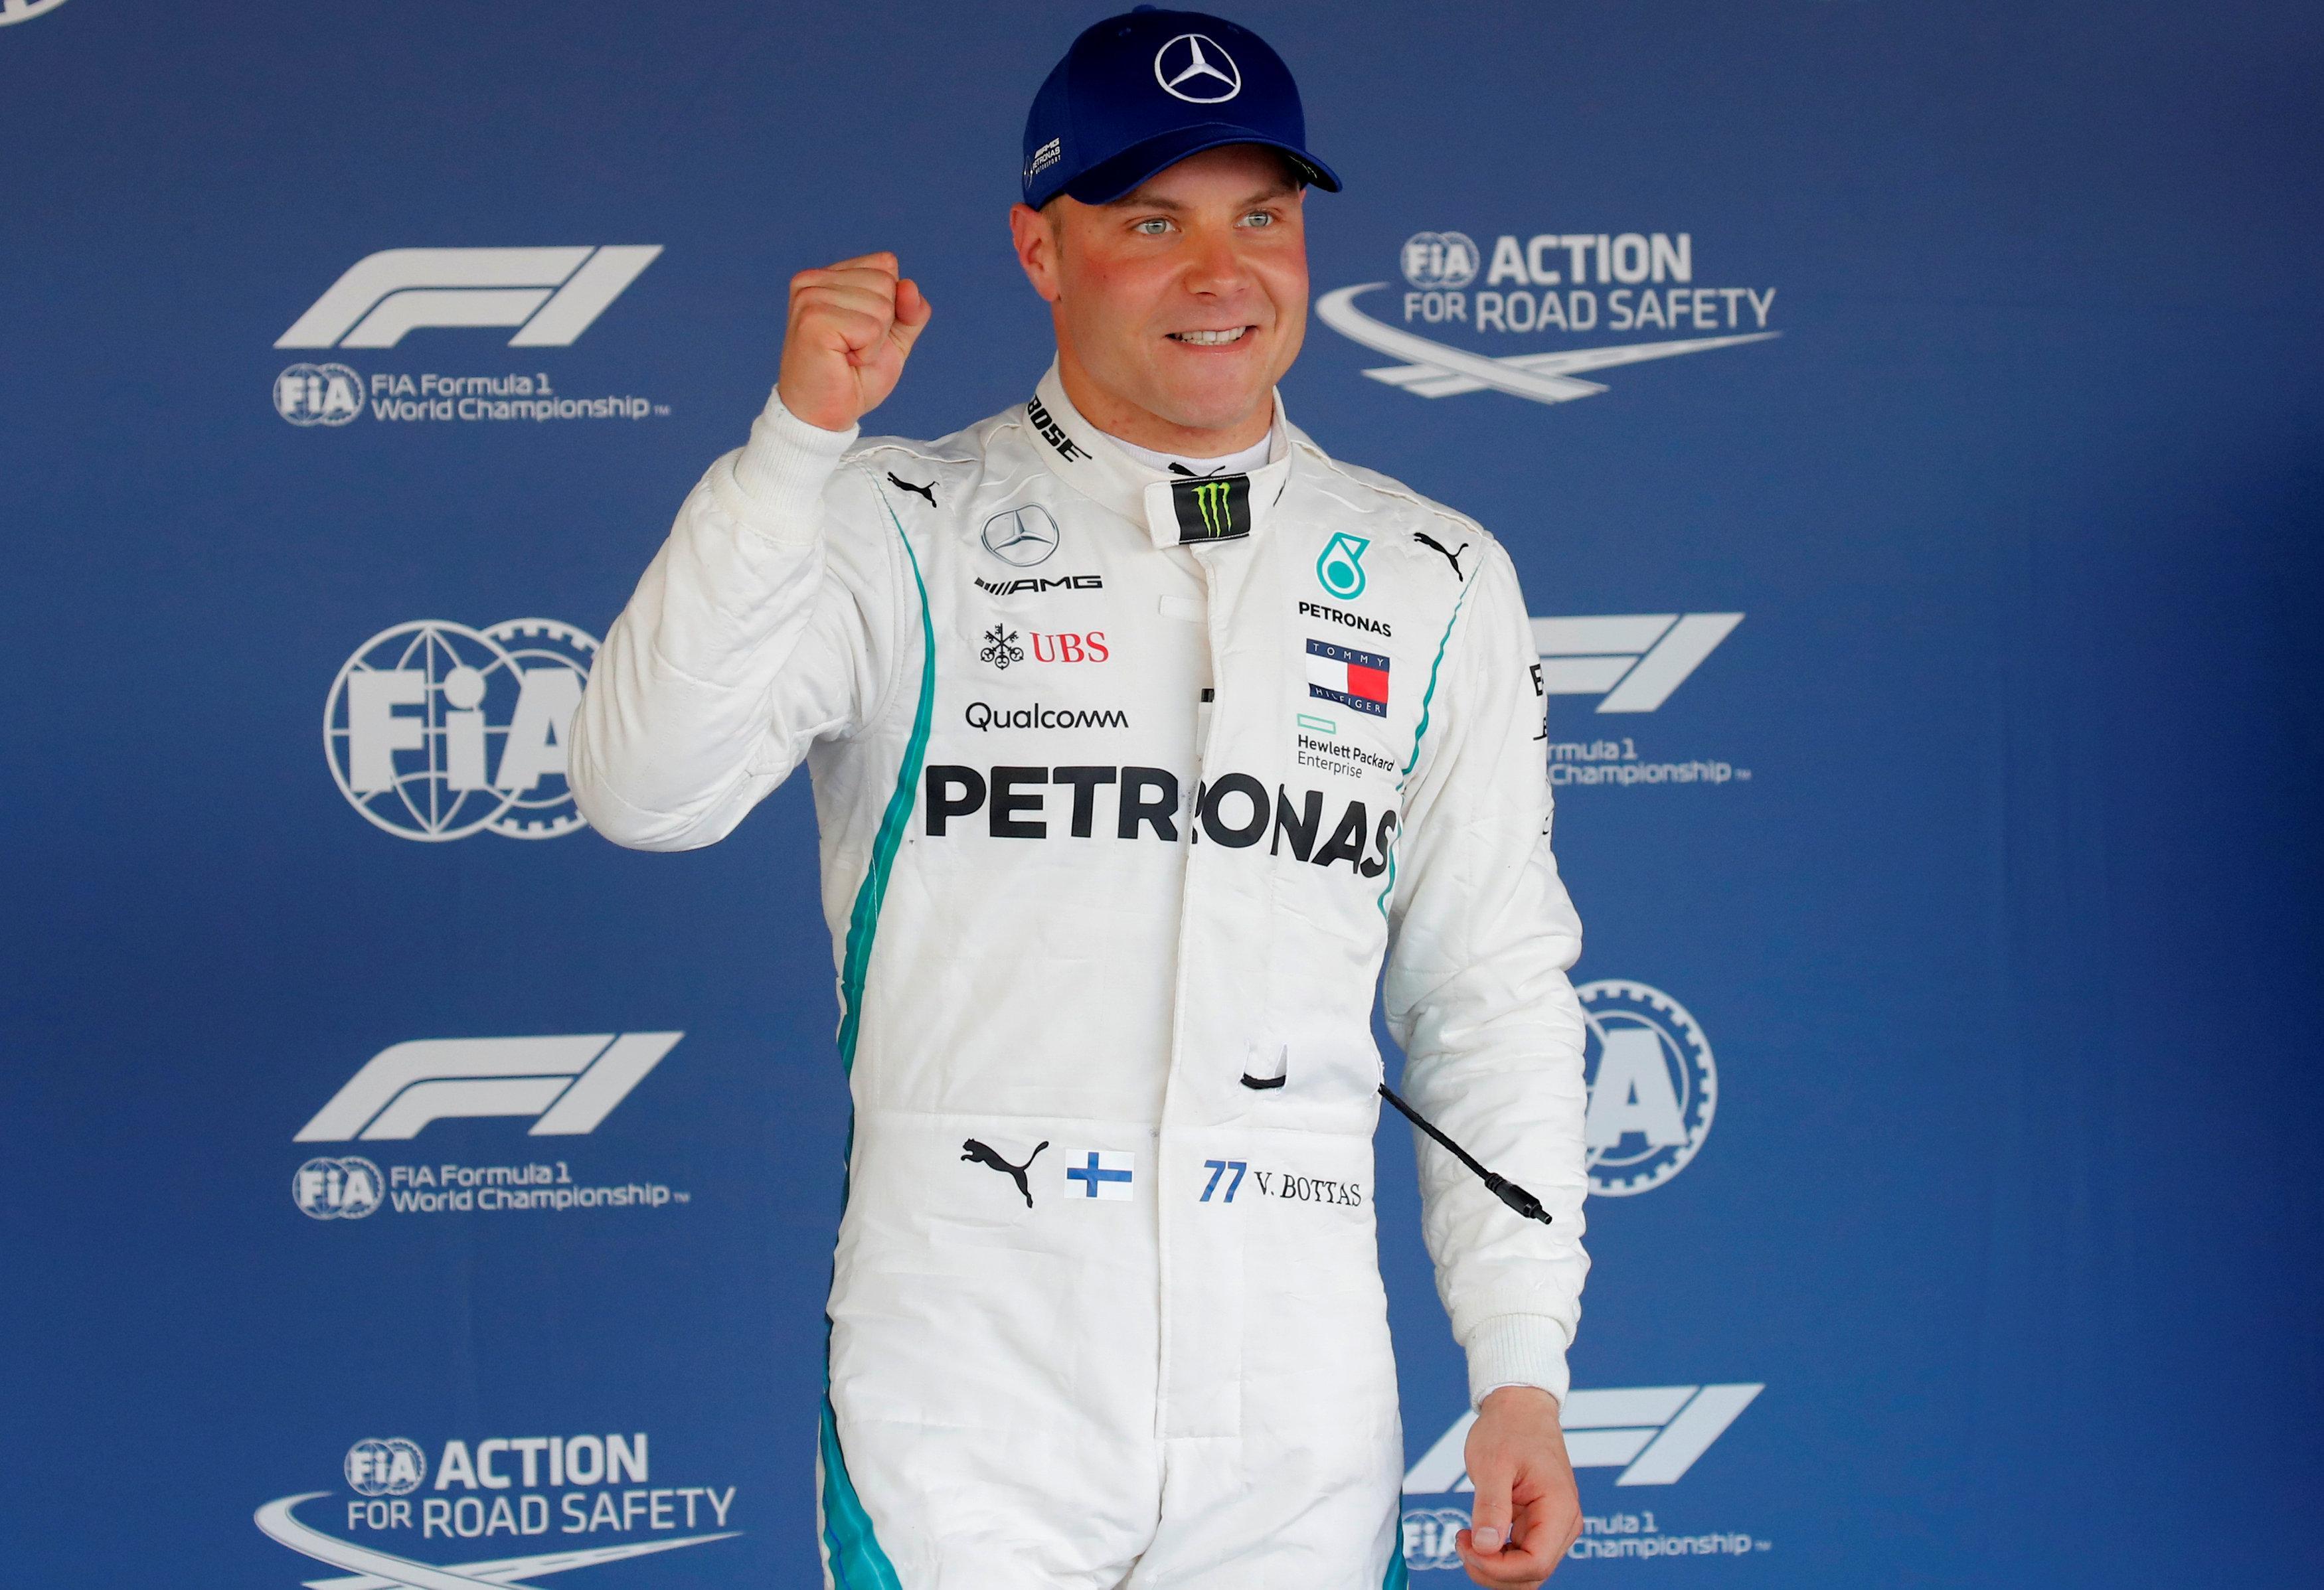 Valterri Bottas won his first ever GP at Sochi and enjoys the track